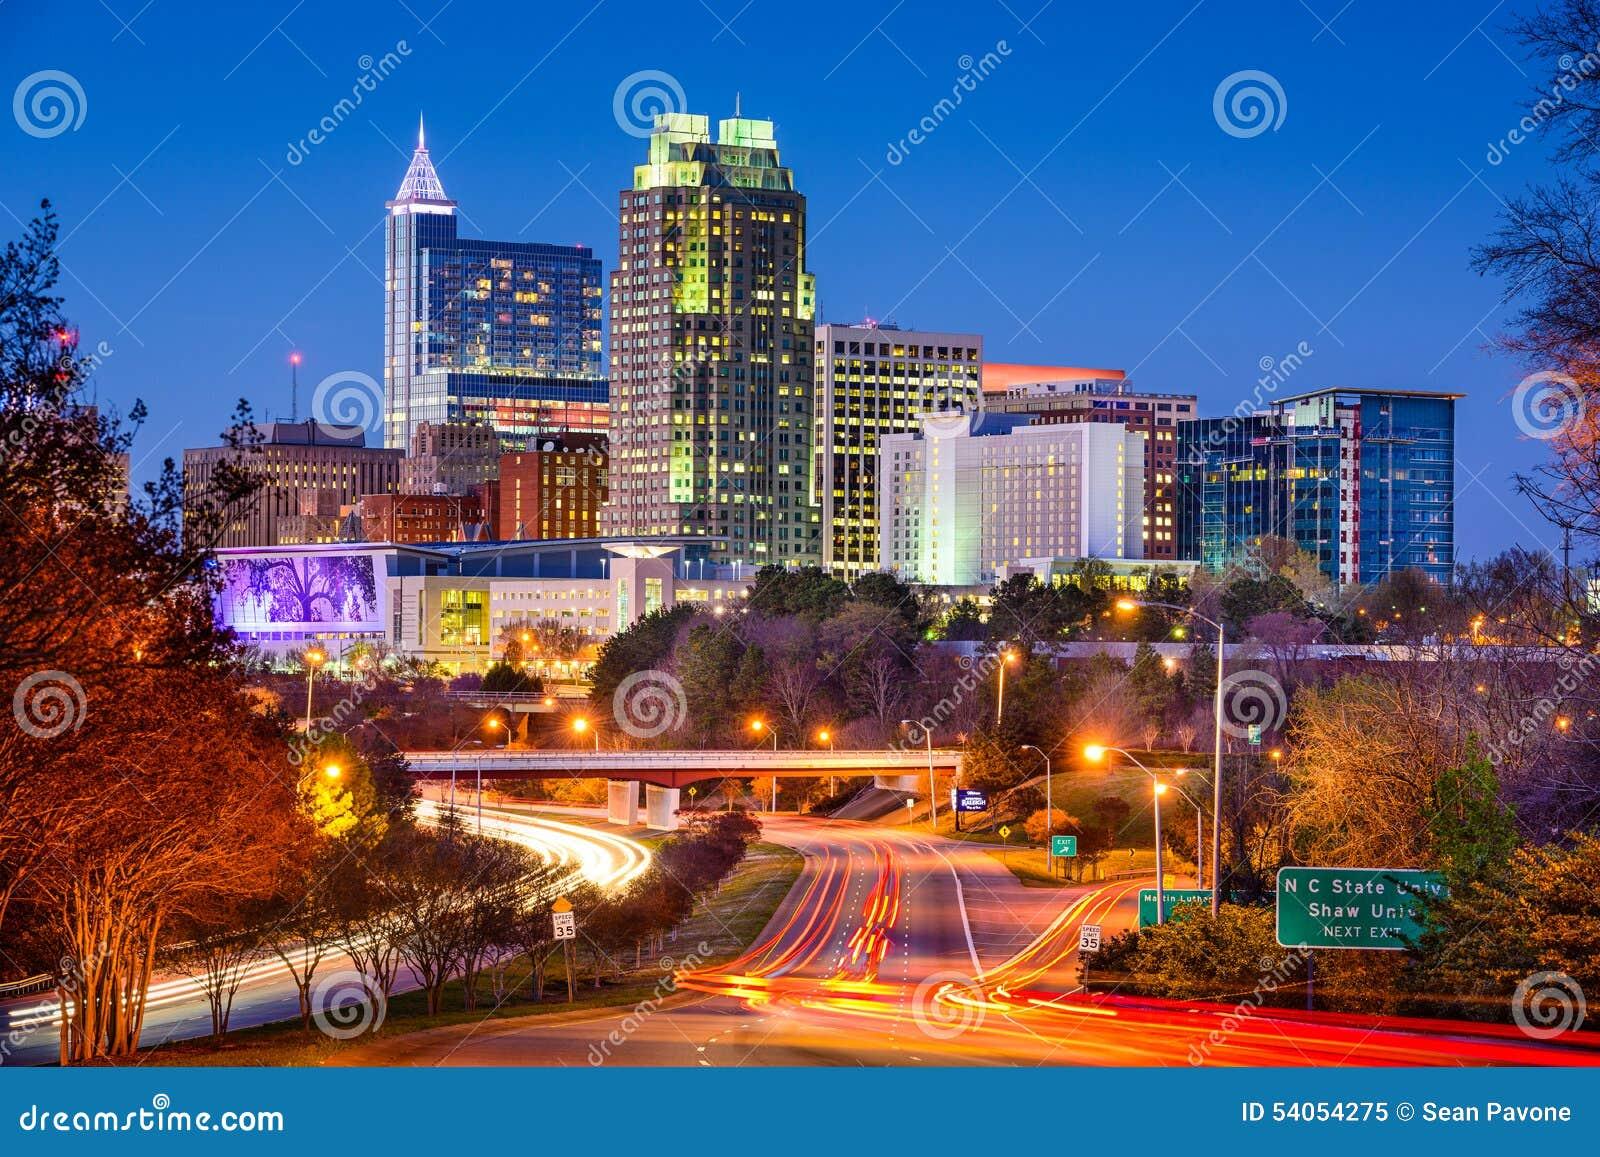 Raleigh North Carolina Skyline